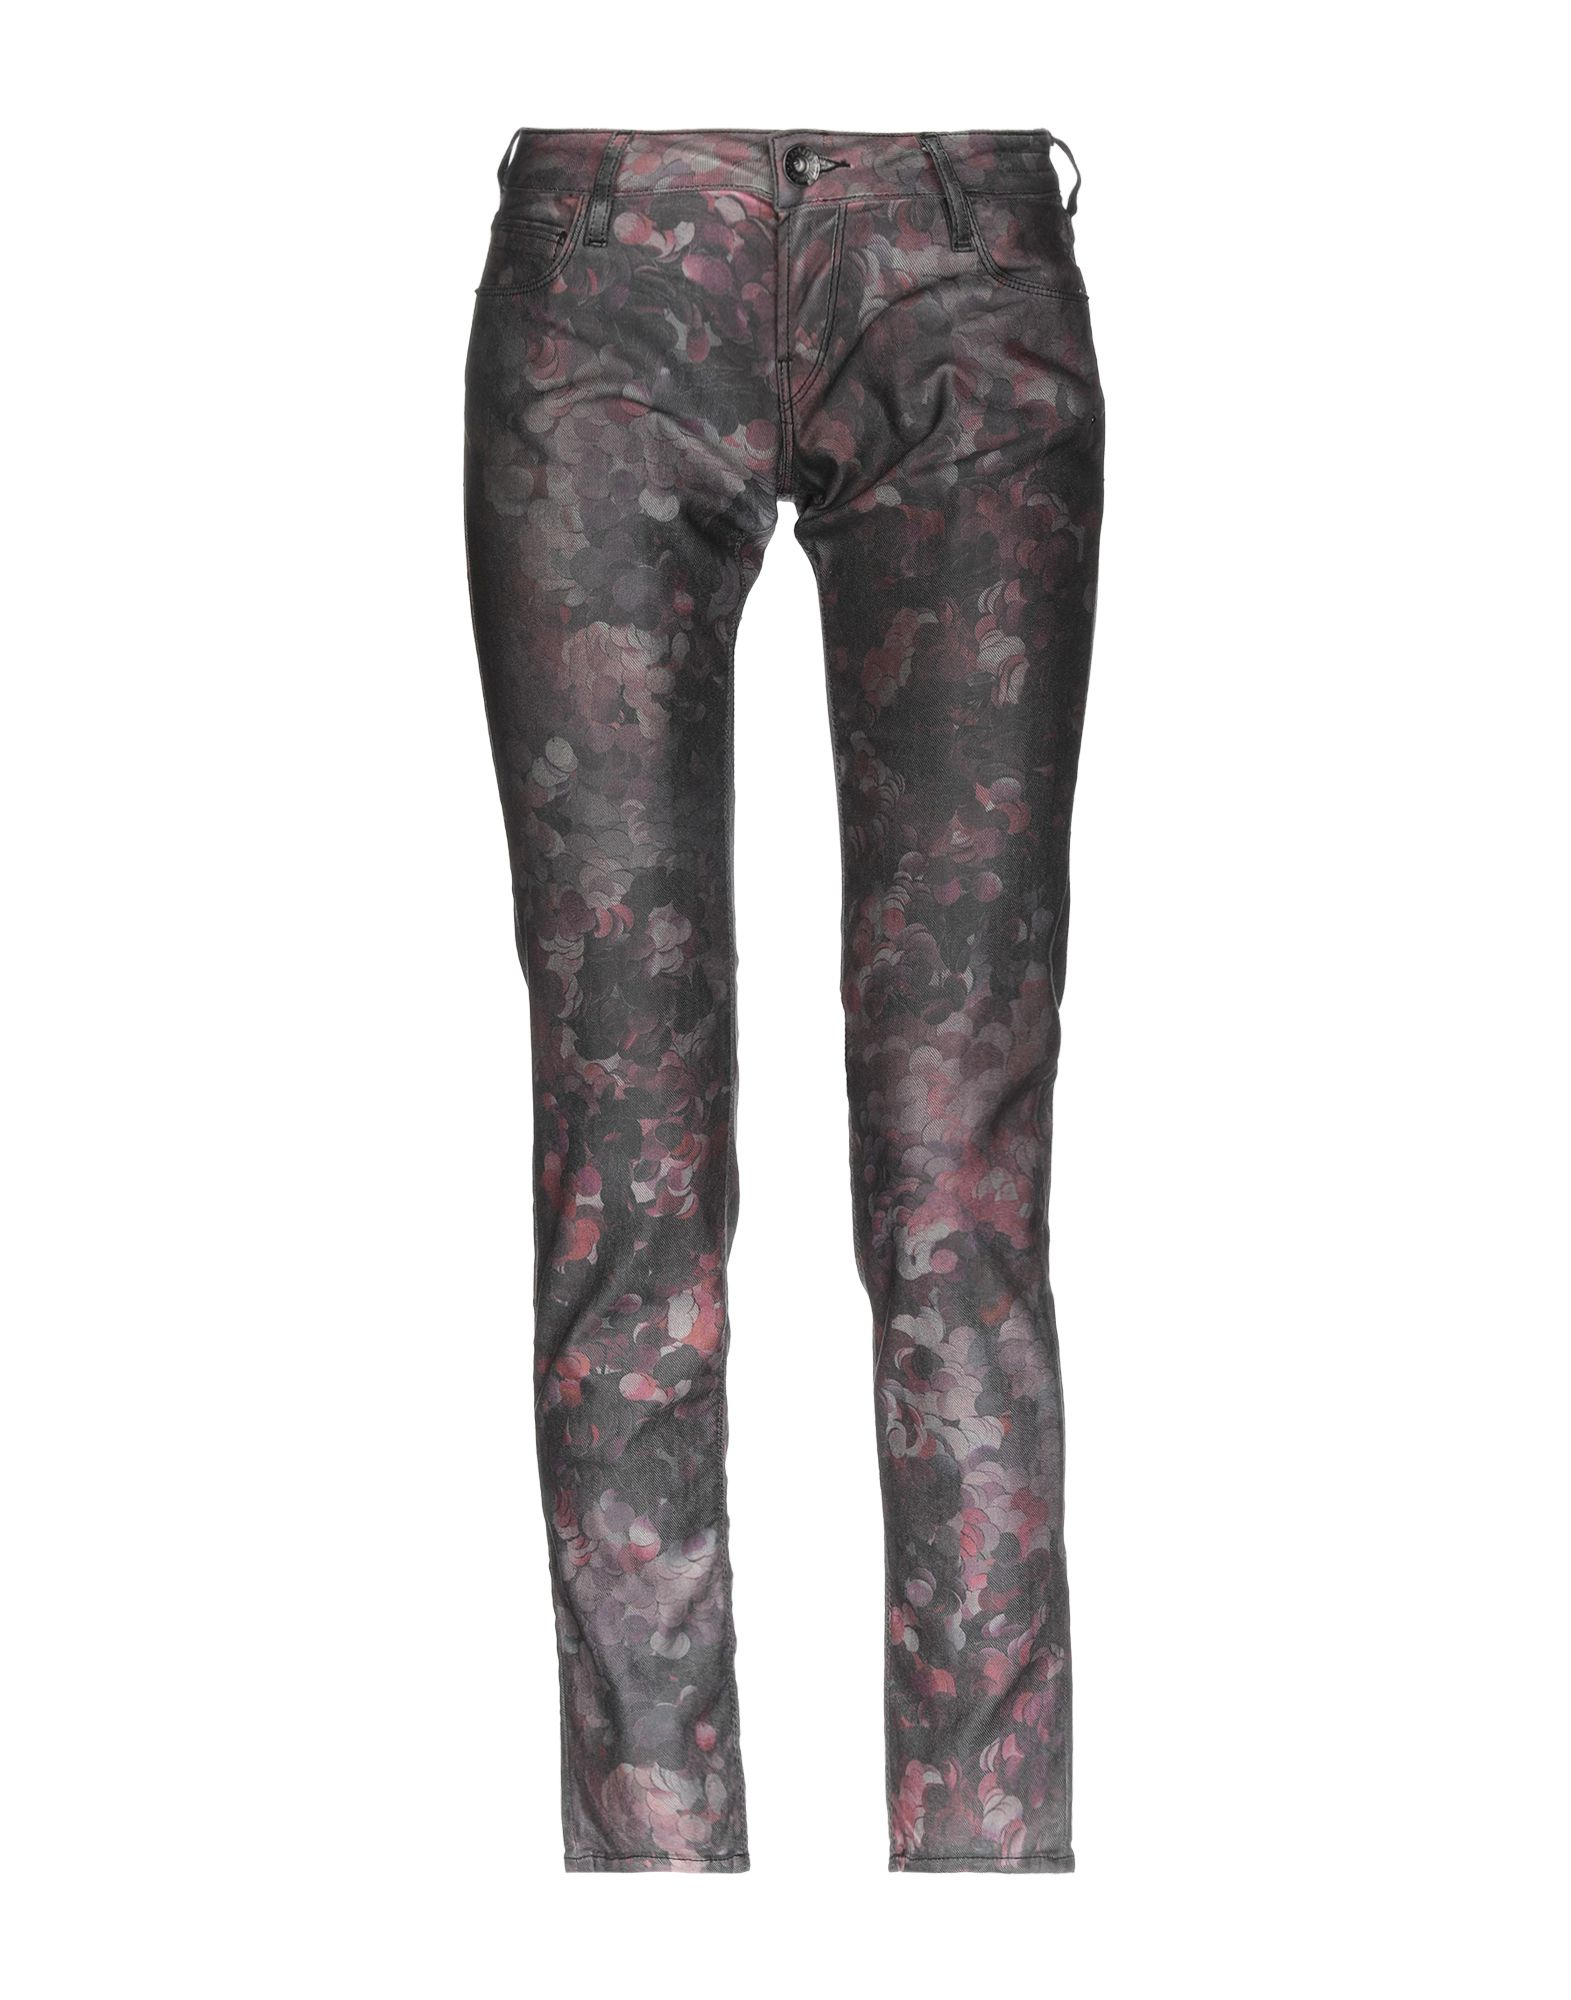 GUESS Damen Jeanshose2 violet